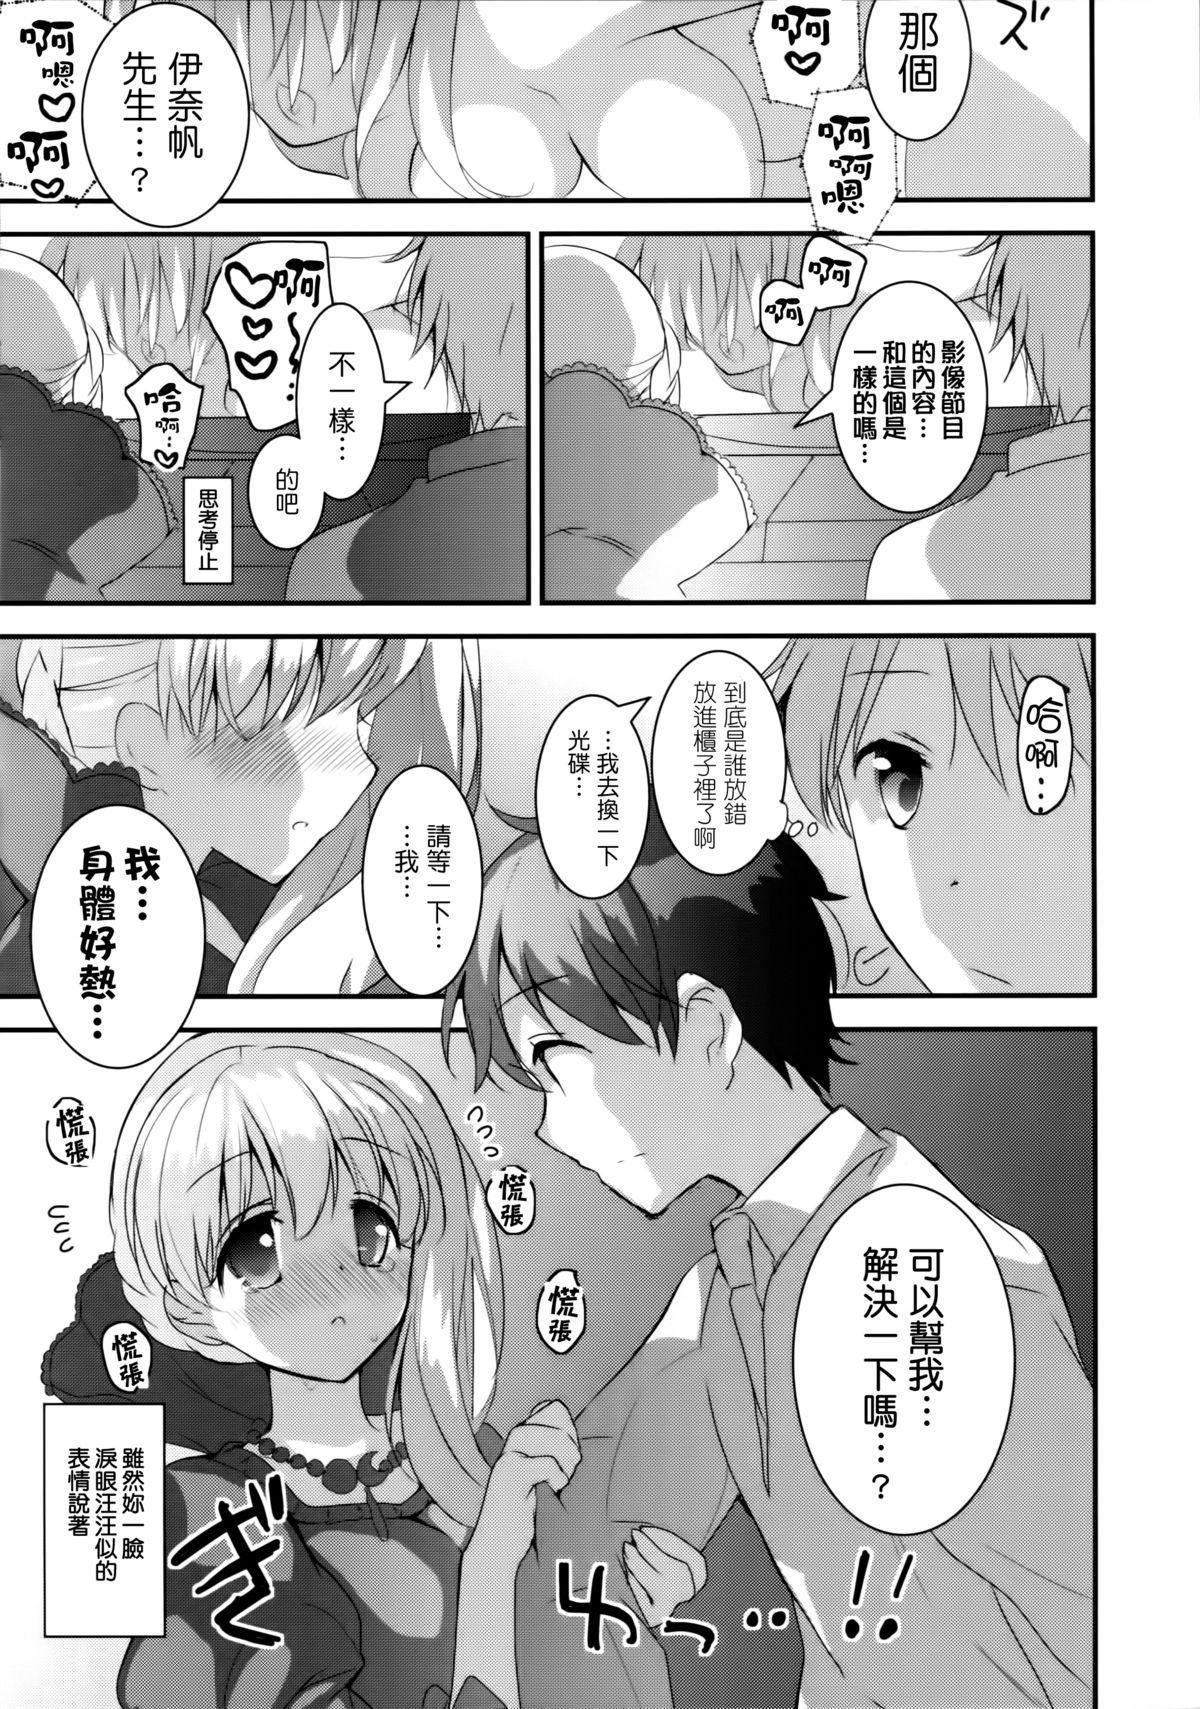 Kasei Hime no Otoshikata 6